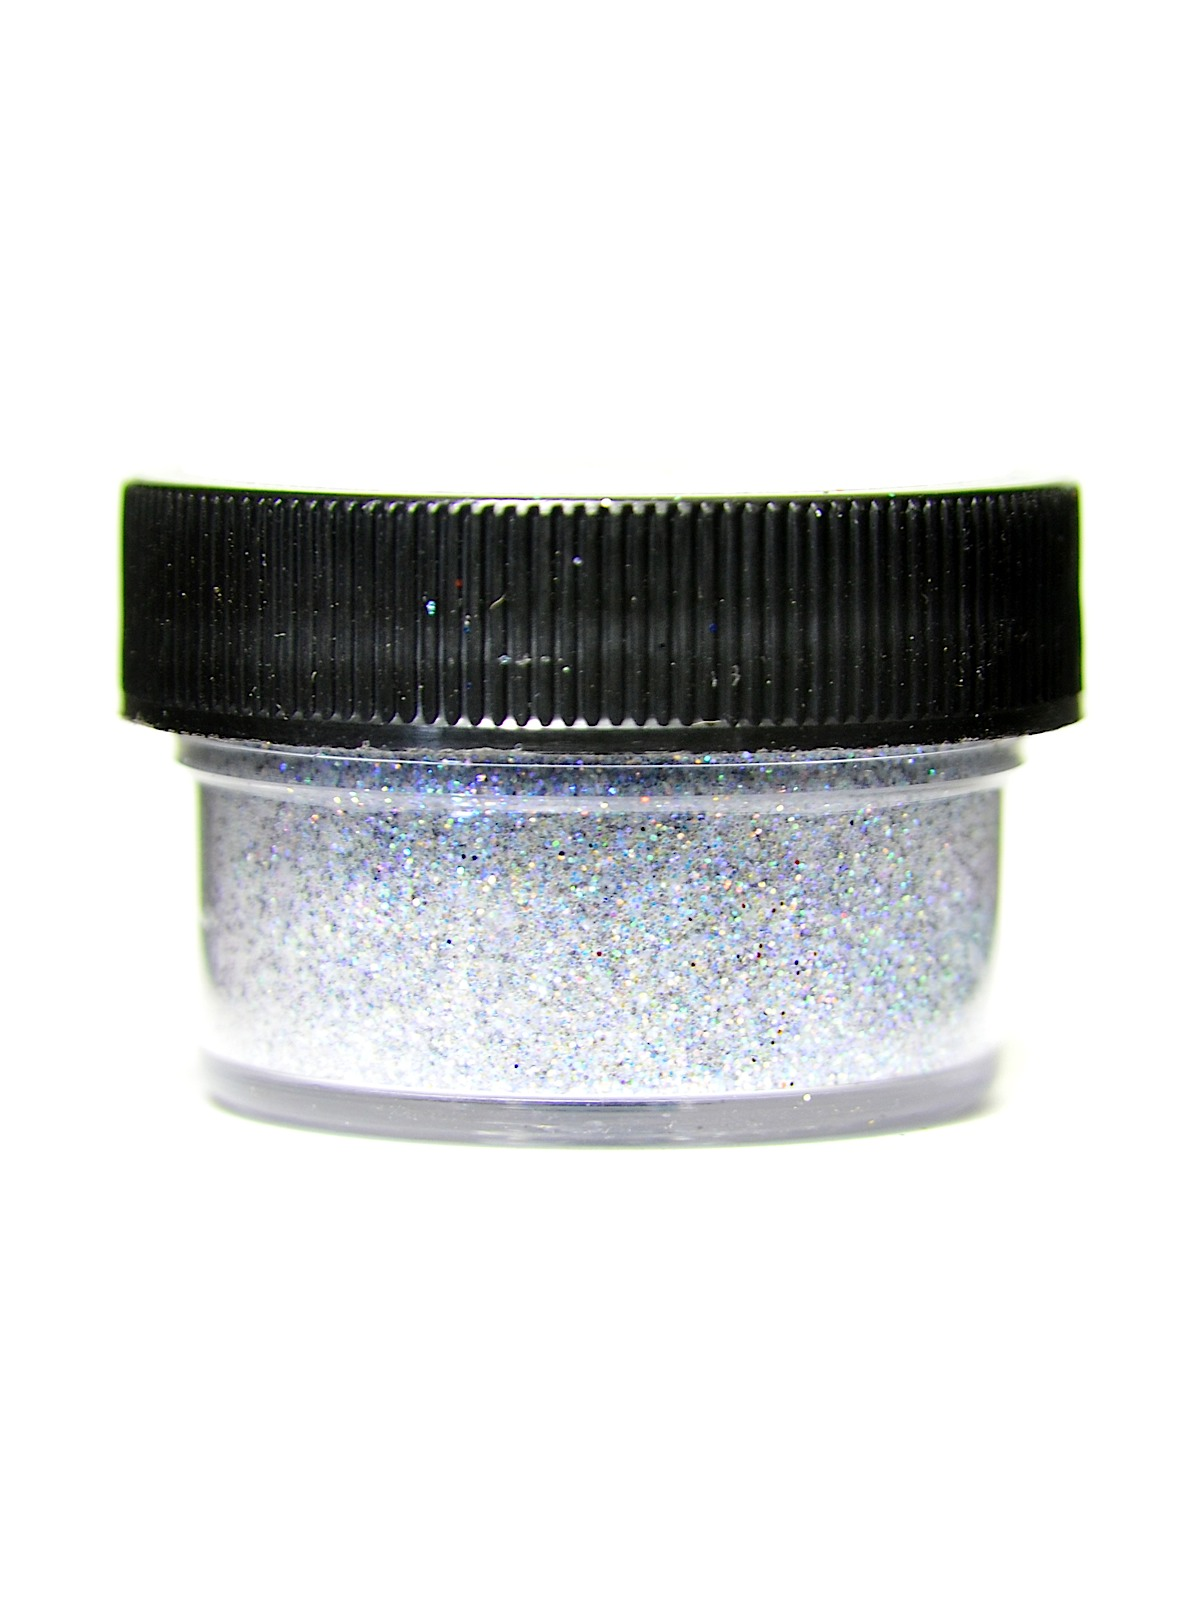 Ultrafine Transparent Glitter Glacier 1 2 Oz. Jar